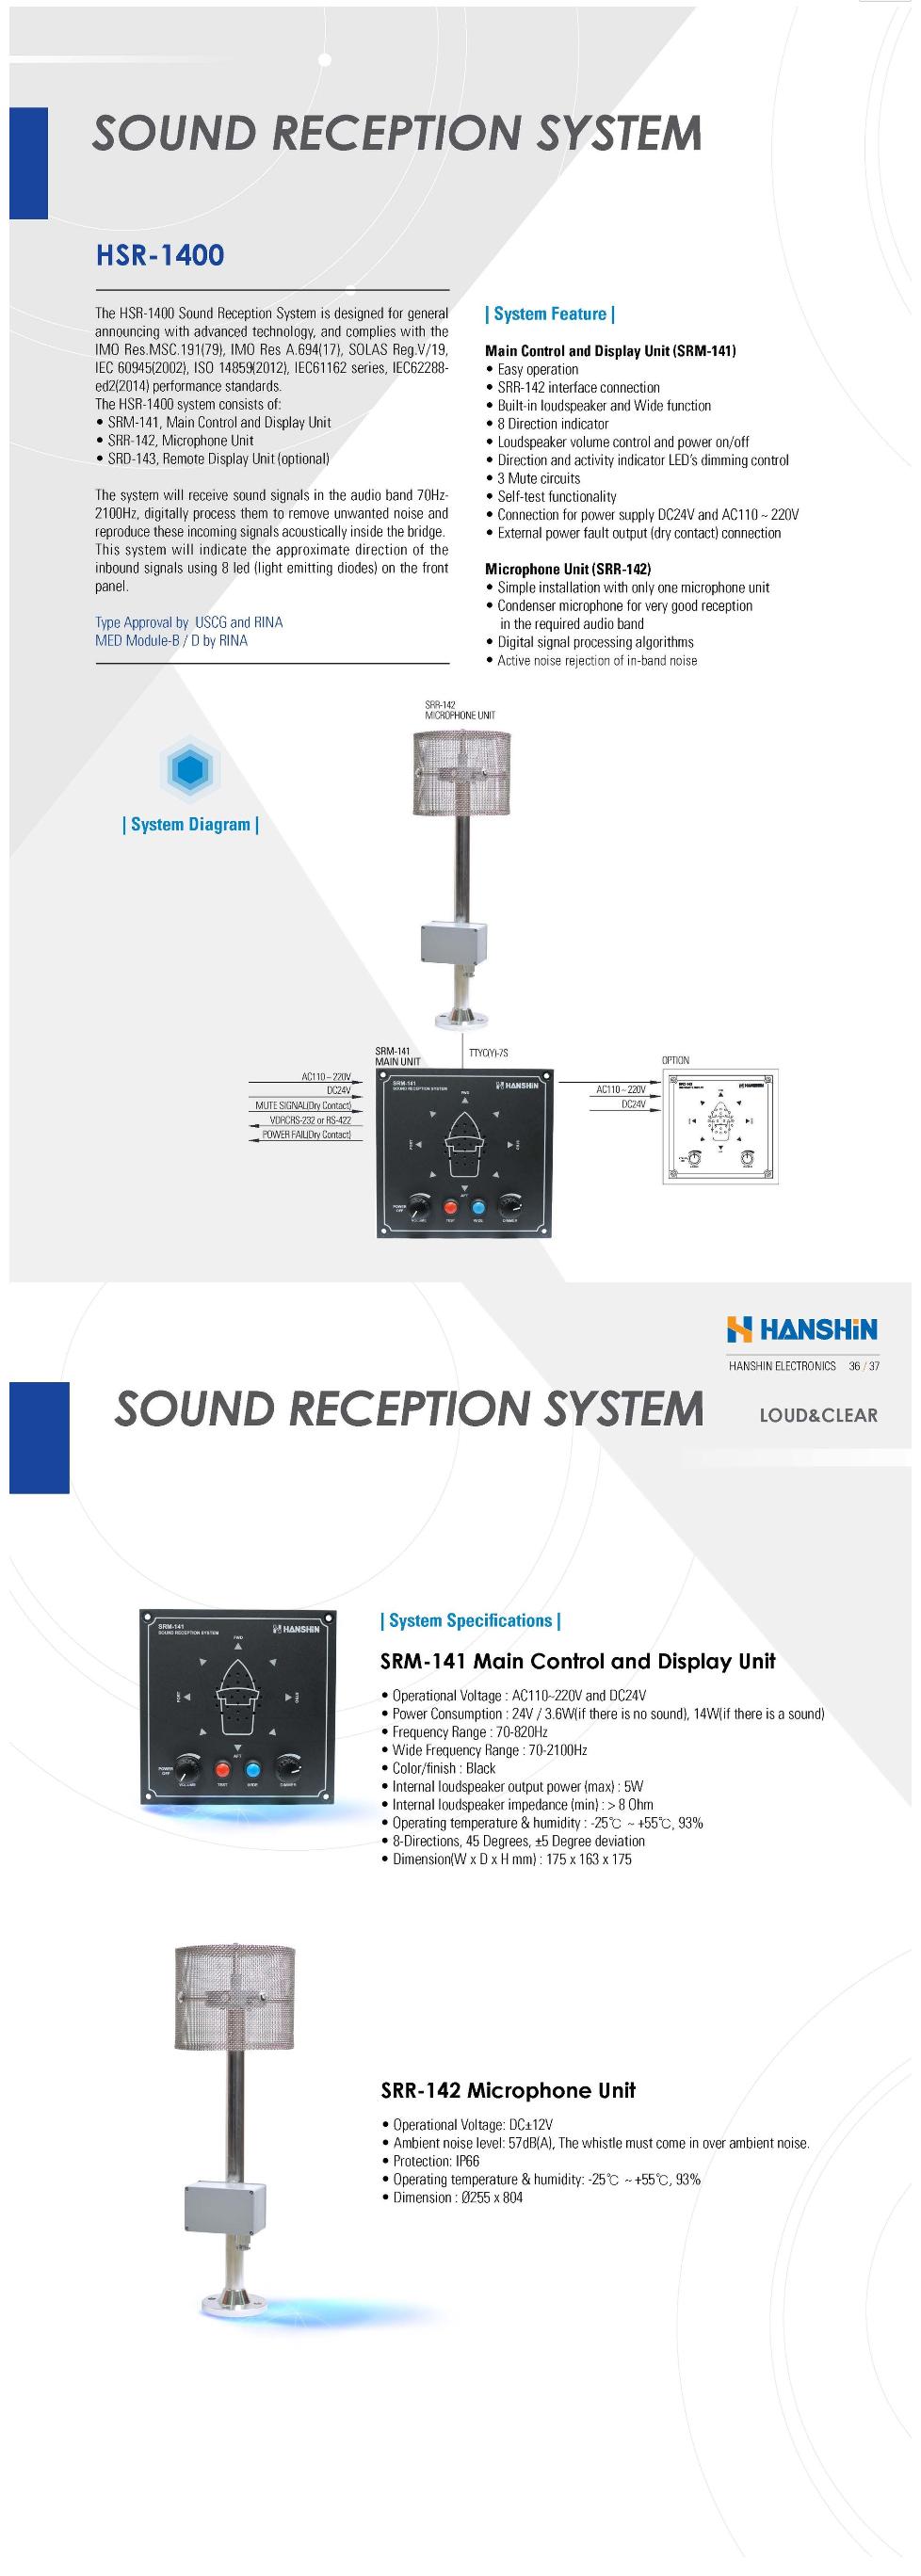 Hanshin Electronics Sound Reception System HSR-1400, SRM-141, SRR-142